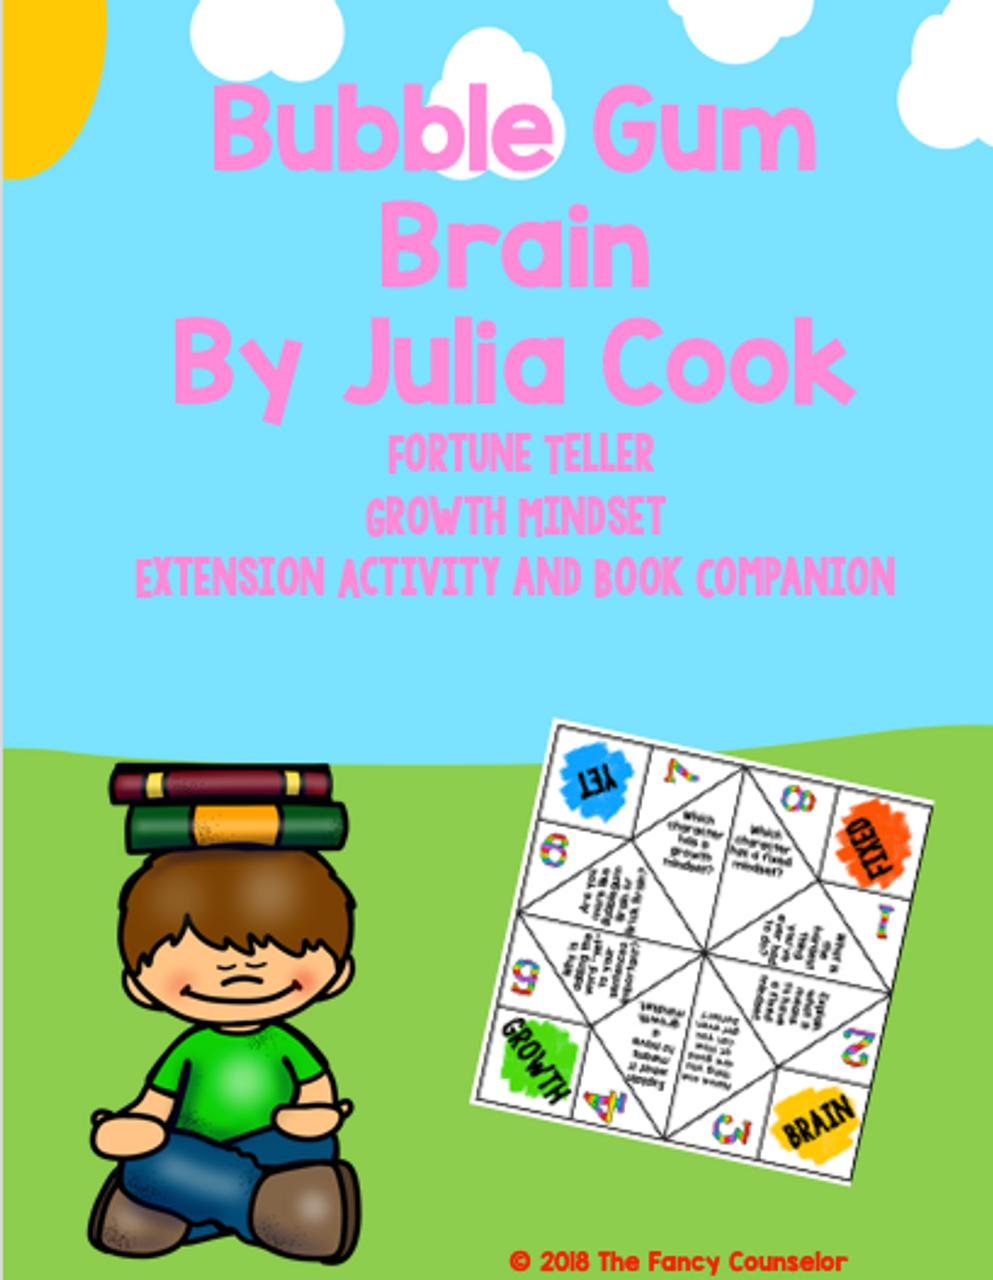 Bubblegum Brain by Julia Cook Growth MIndset Story Extension Activity Craftivity